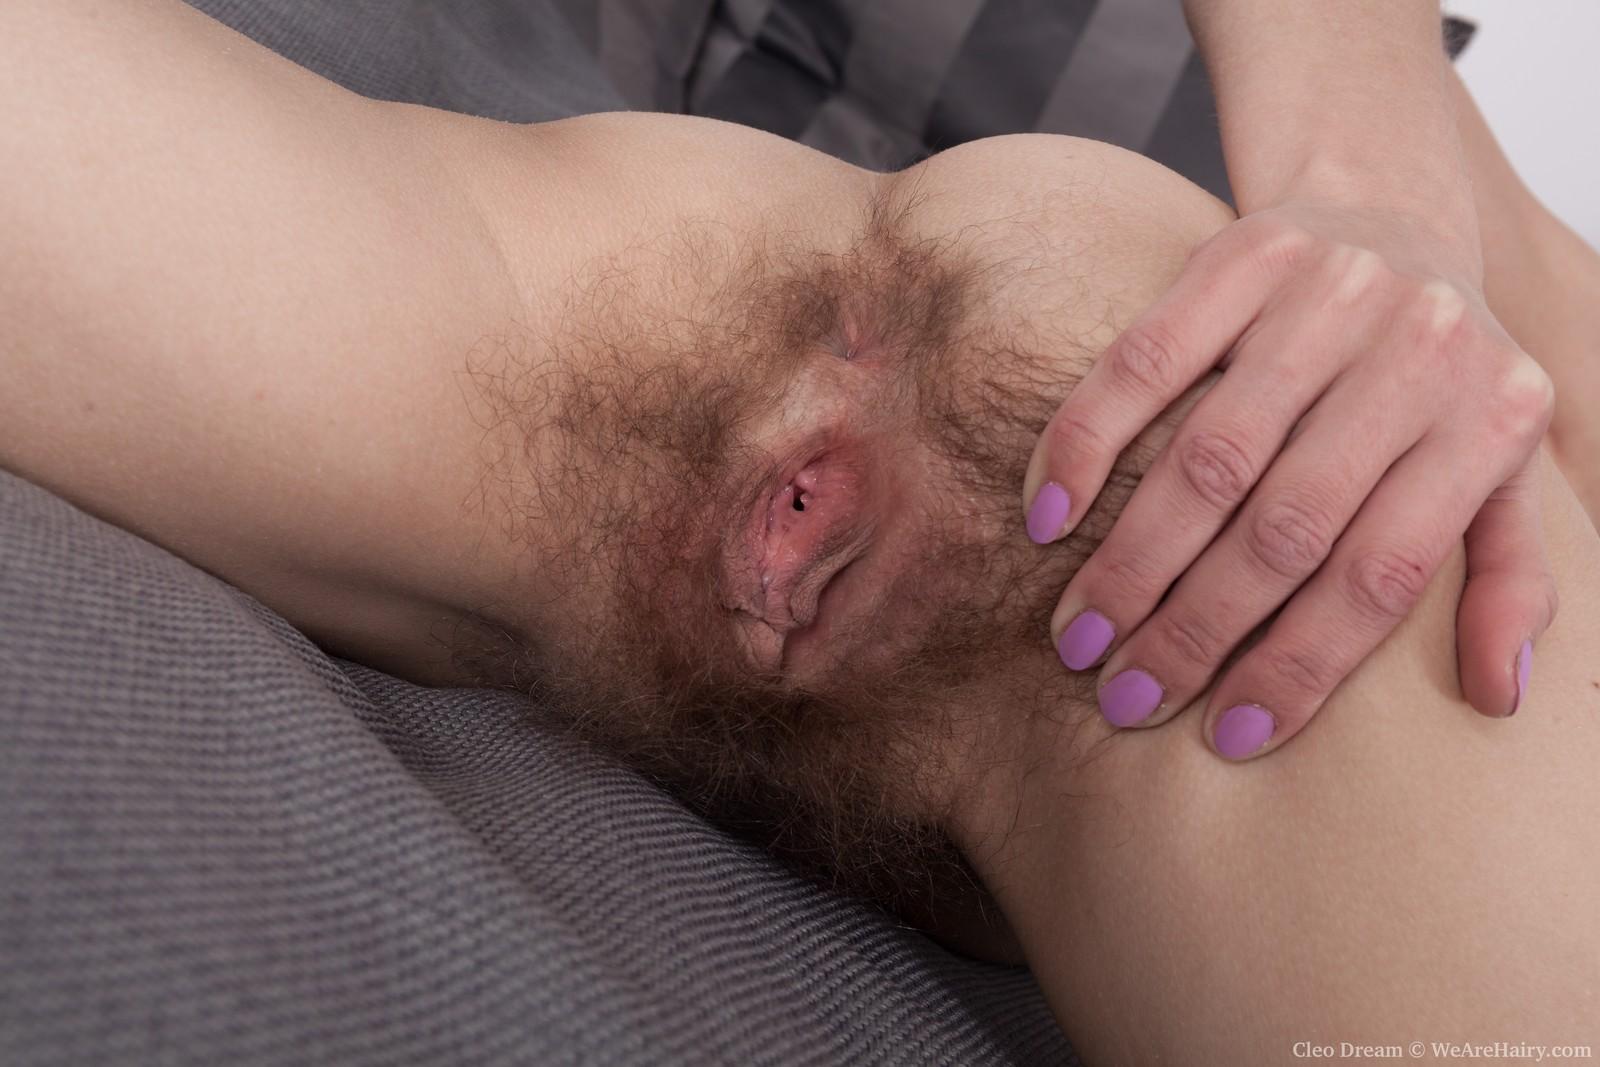 cleo-dream-slides-off-her-black-lingerie-in-bed12.jpg